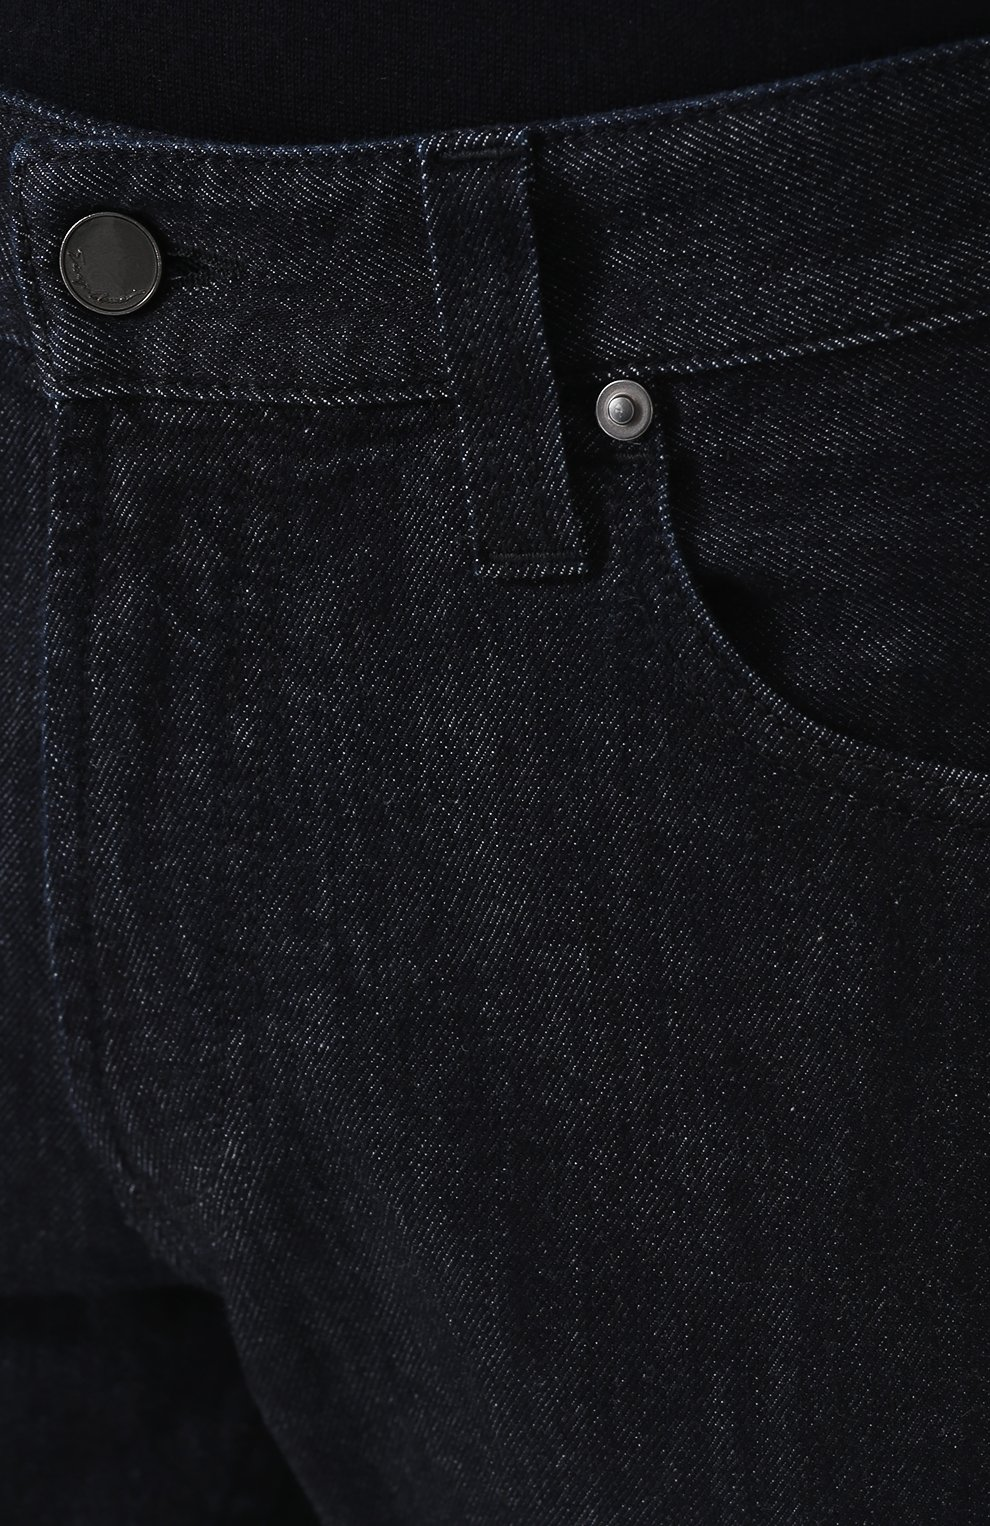 Мужские джинсы прямого кроя GIORGIO ARMANI синего цвета, арт. 6ZSJ15/SD30Z   Фото 5